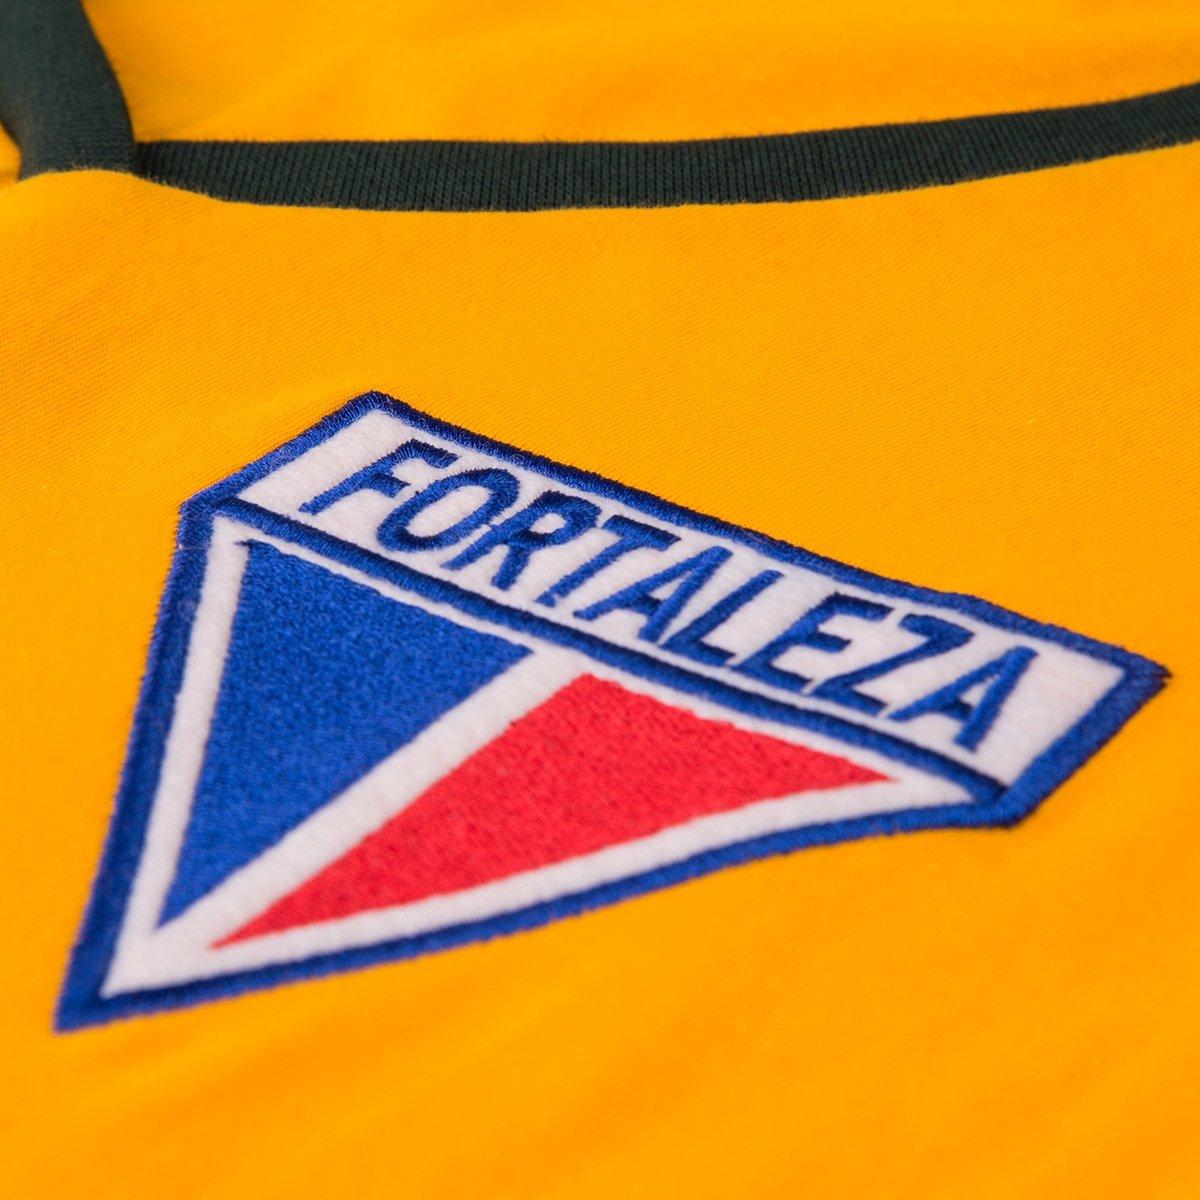 Brasil Retrô Torcedor Camisa Feminina Baby Fortaleza Look Amarelo Seleção Gol qxt0B7